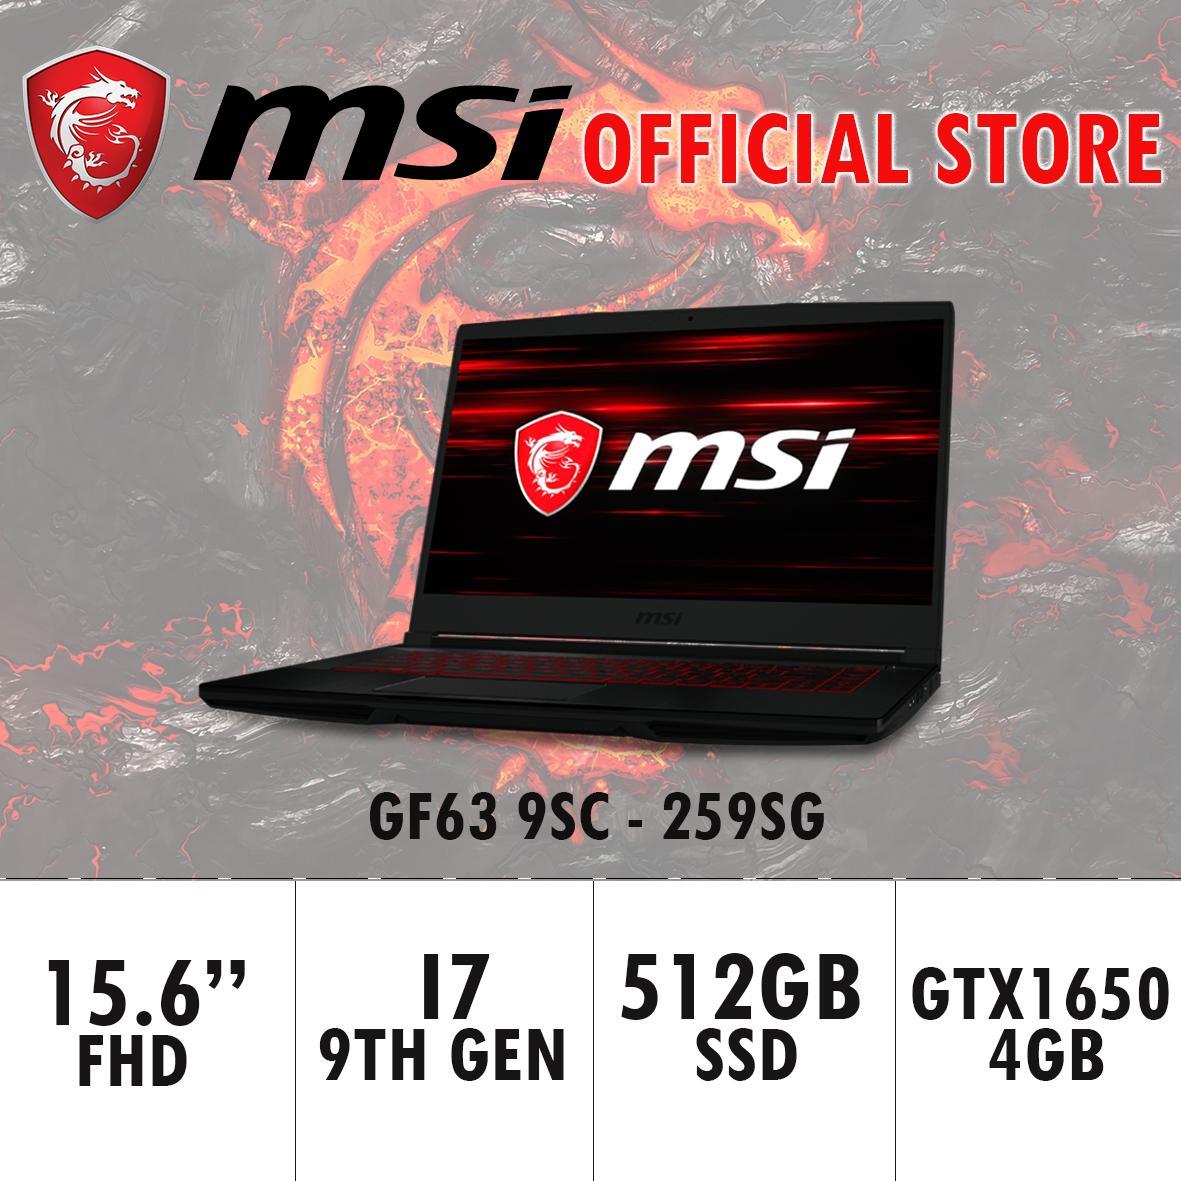 MSI GF63 GTX1650 THIN 9SC - 259SG (i7-9750H / 8GB / 512GB / WIN 10) 15.6 FHD Gaming Laptop